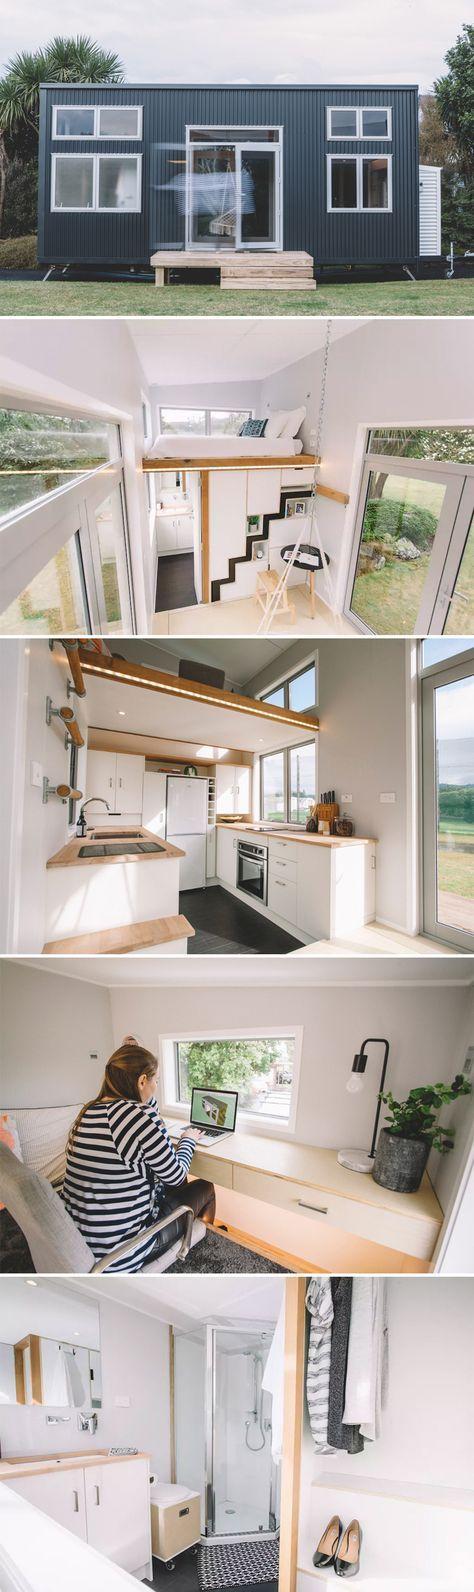 Millennial Tiny House by Build Tiny - Tiny Living #tinyhousebathroom